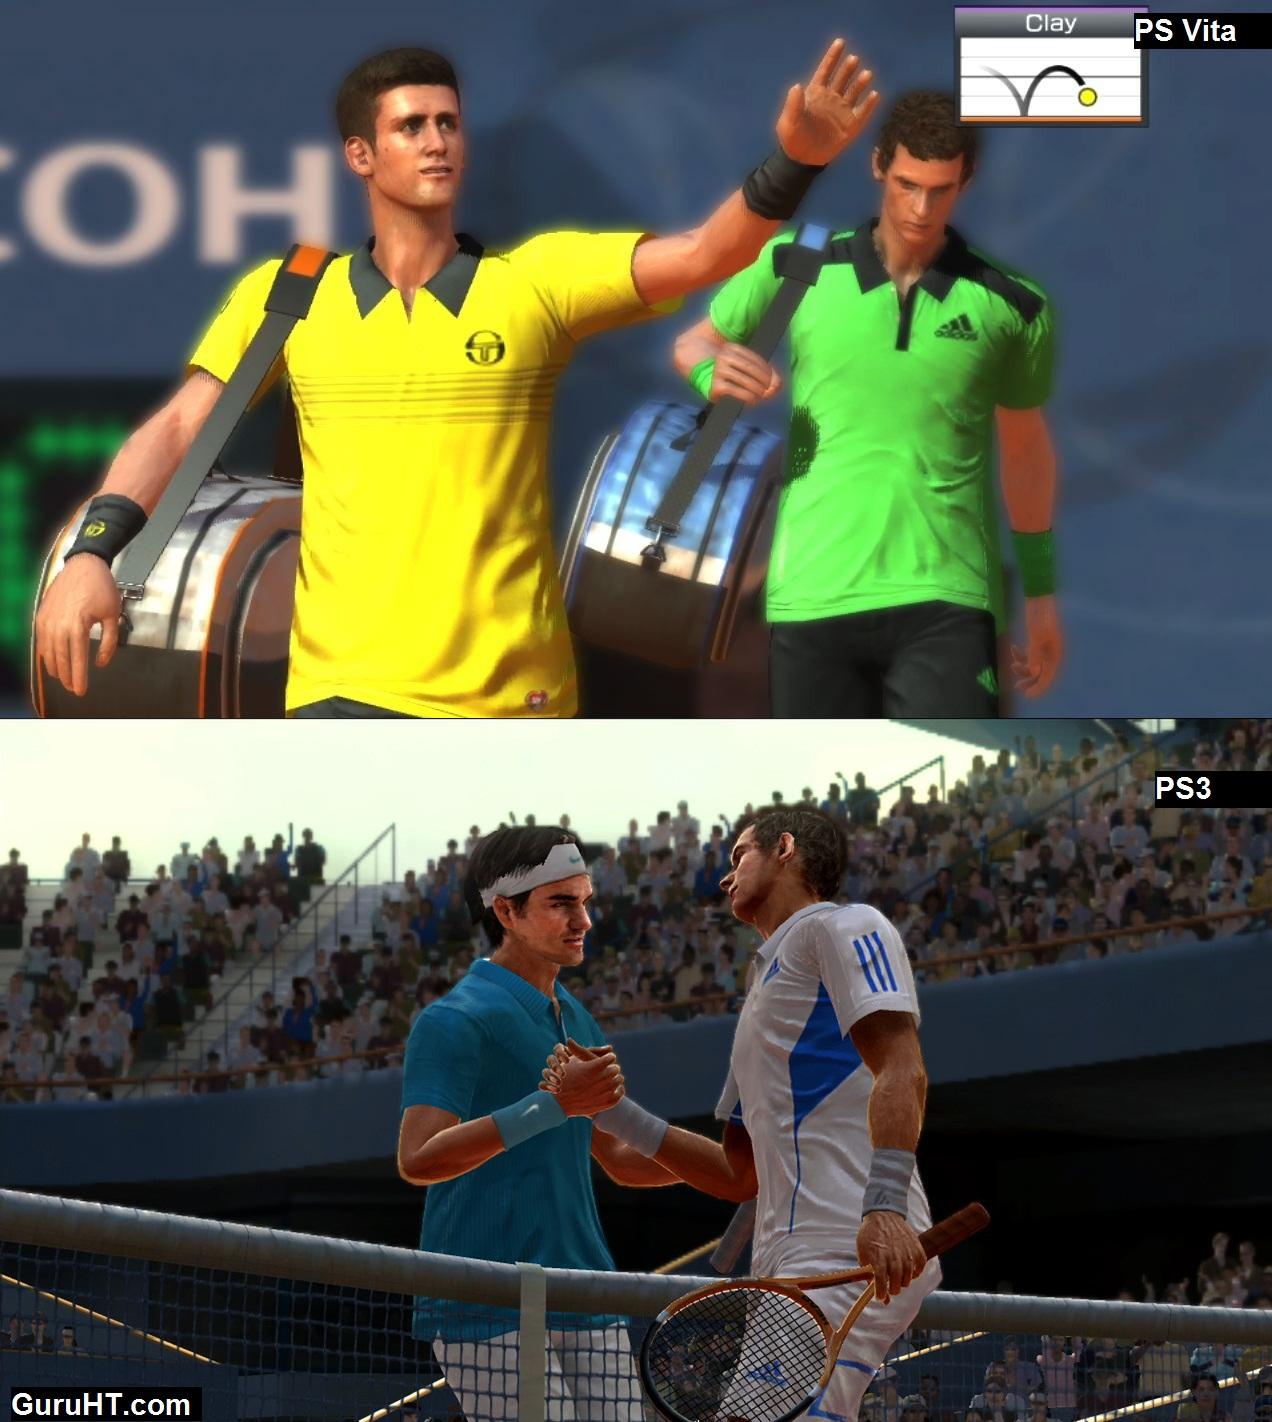 virtua tennis 4 vita download